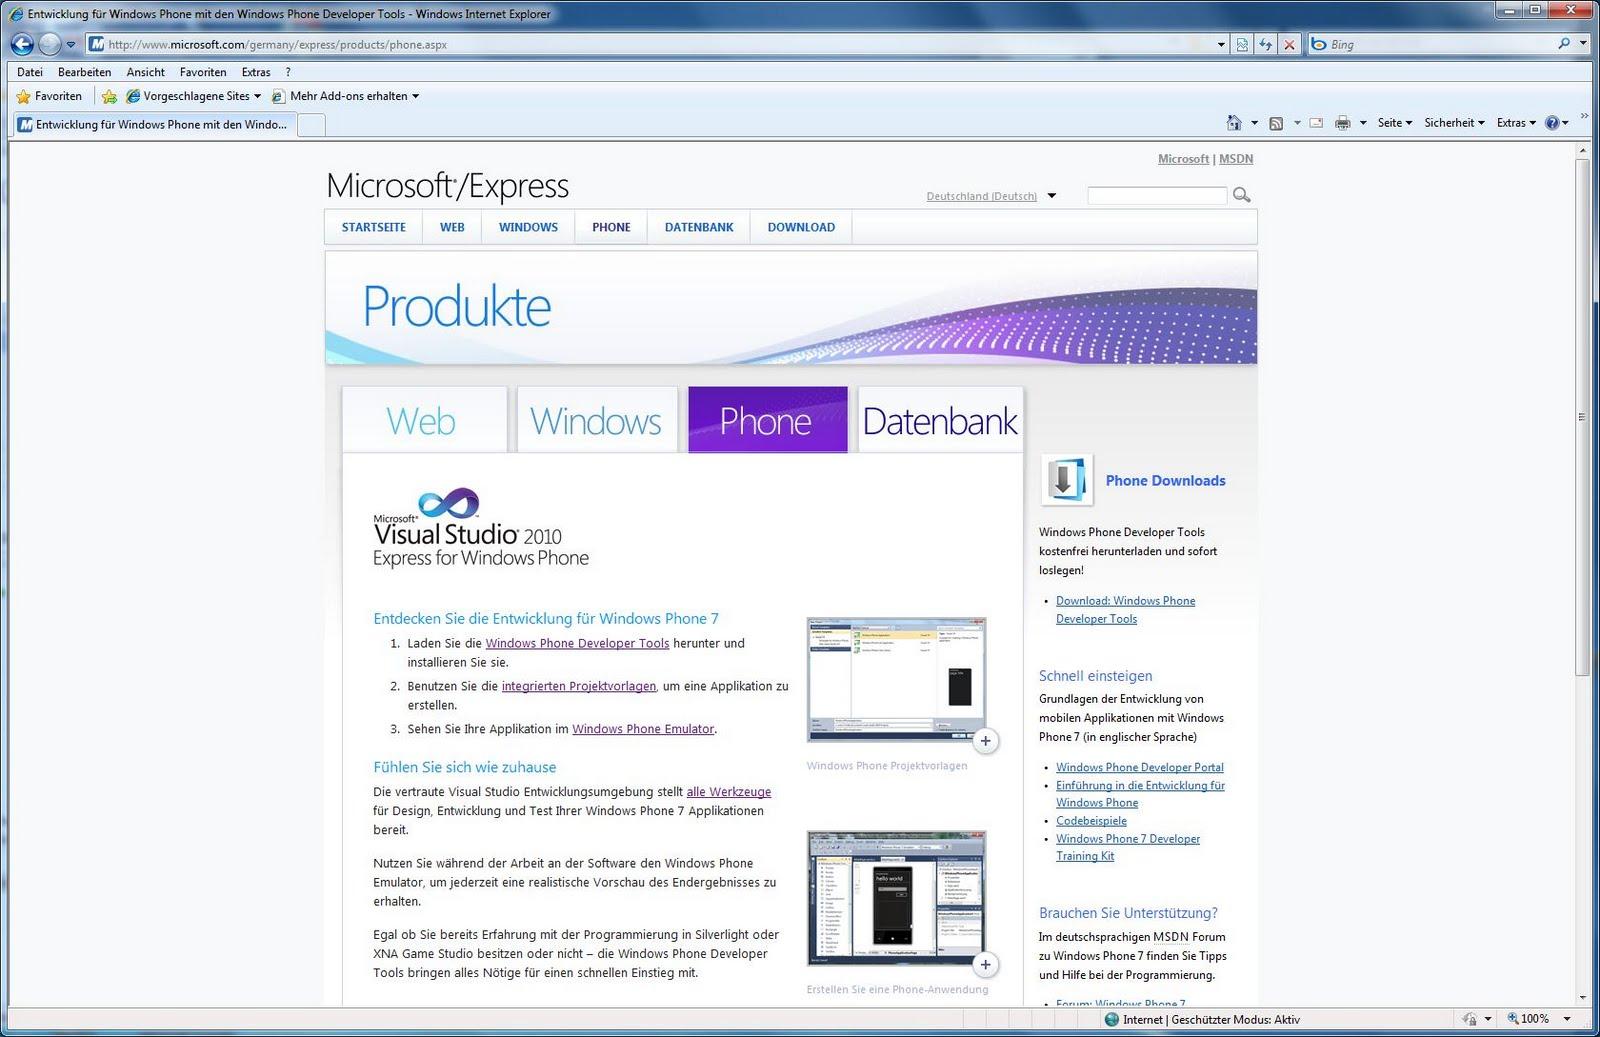 Visual Studio 2010 Express for Windows Phone - PC-WELT